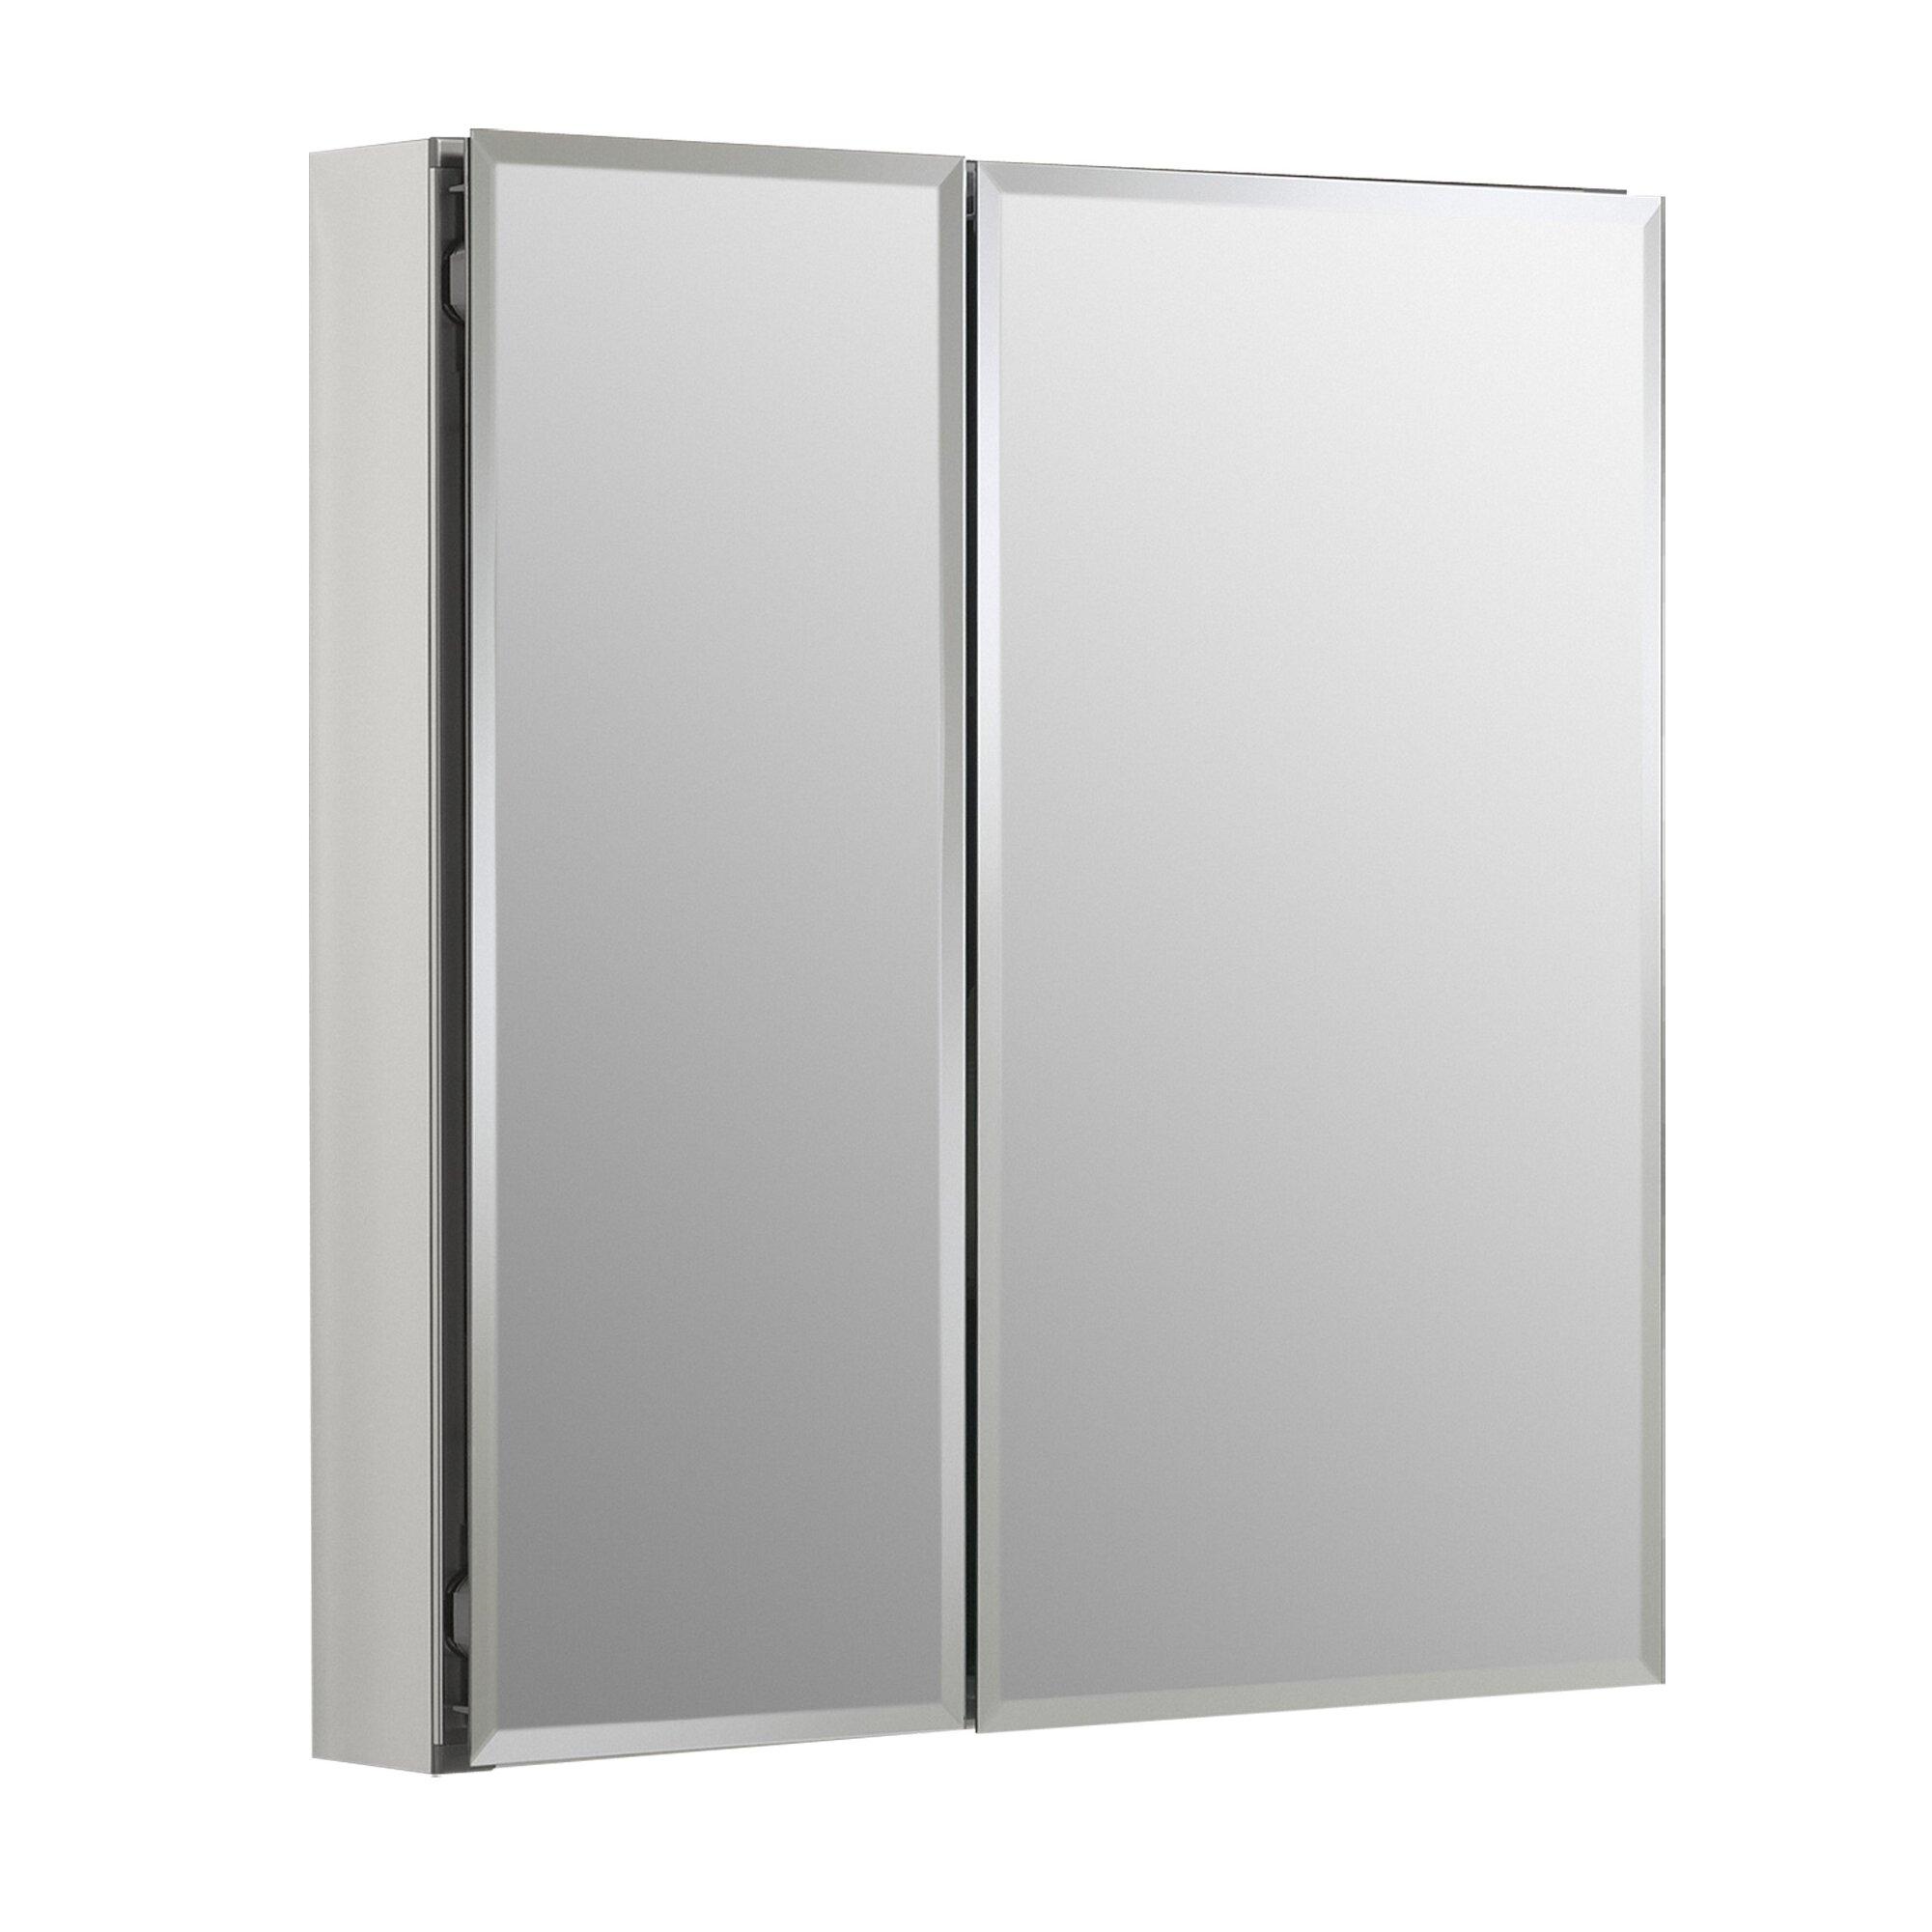 kohler 25 x 26 aluminum mirrored medicine cabinet reviews wayfair. Black Bedroom Furniture Sets. Home Design Ideas